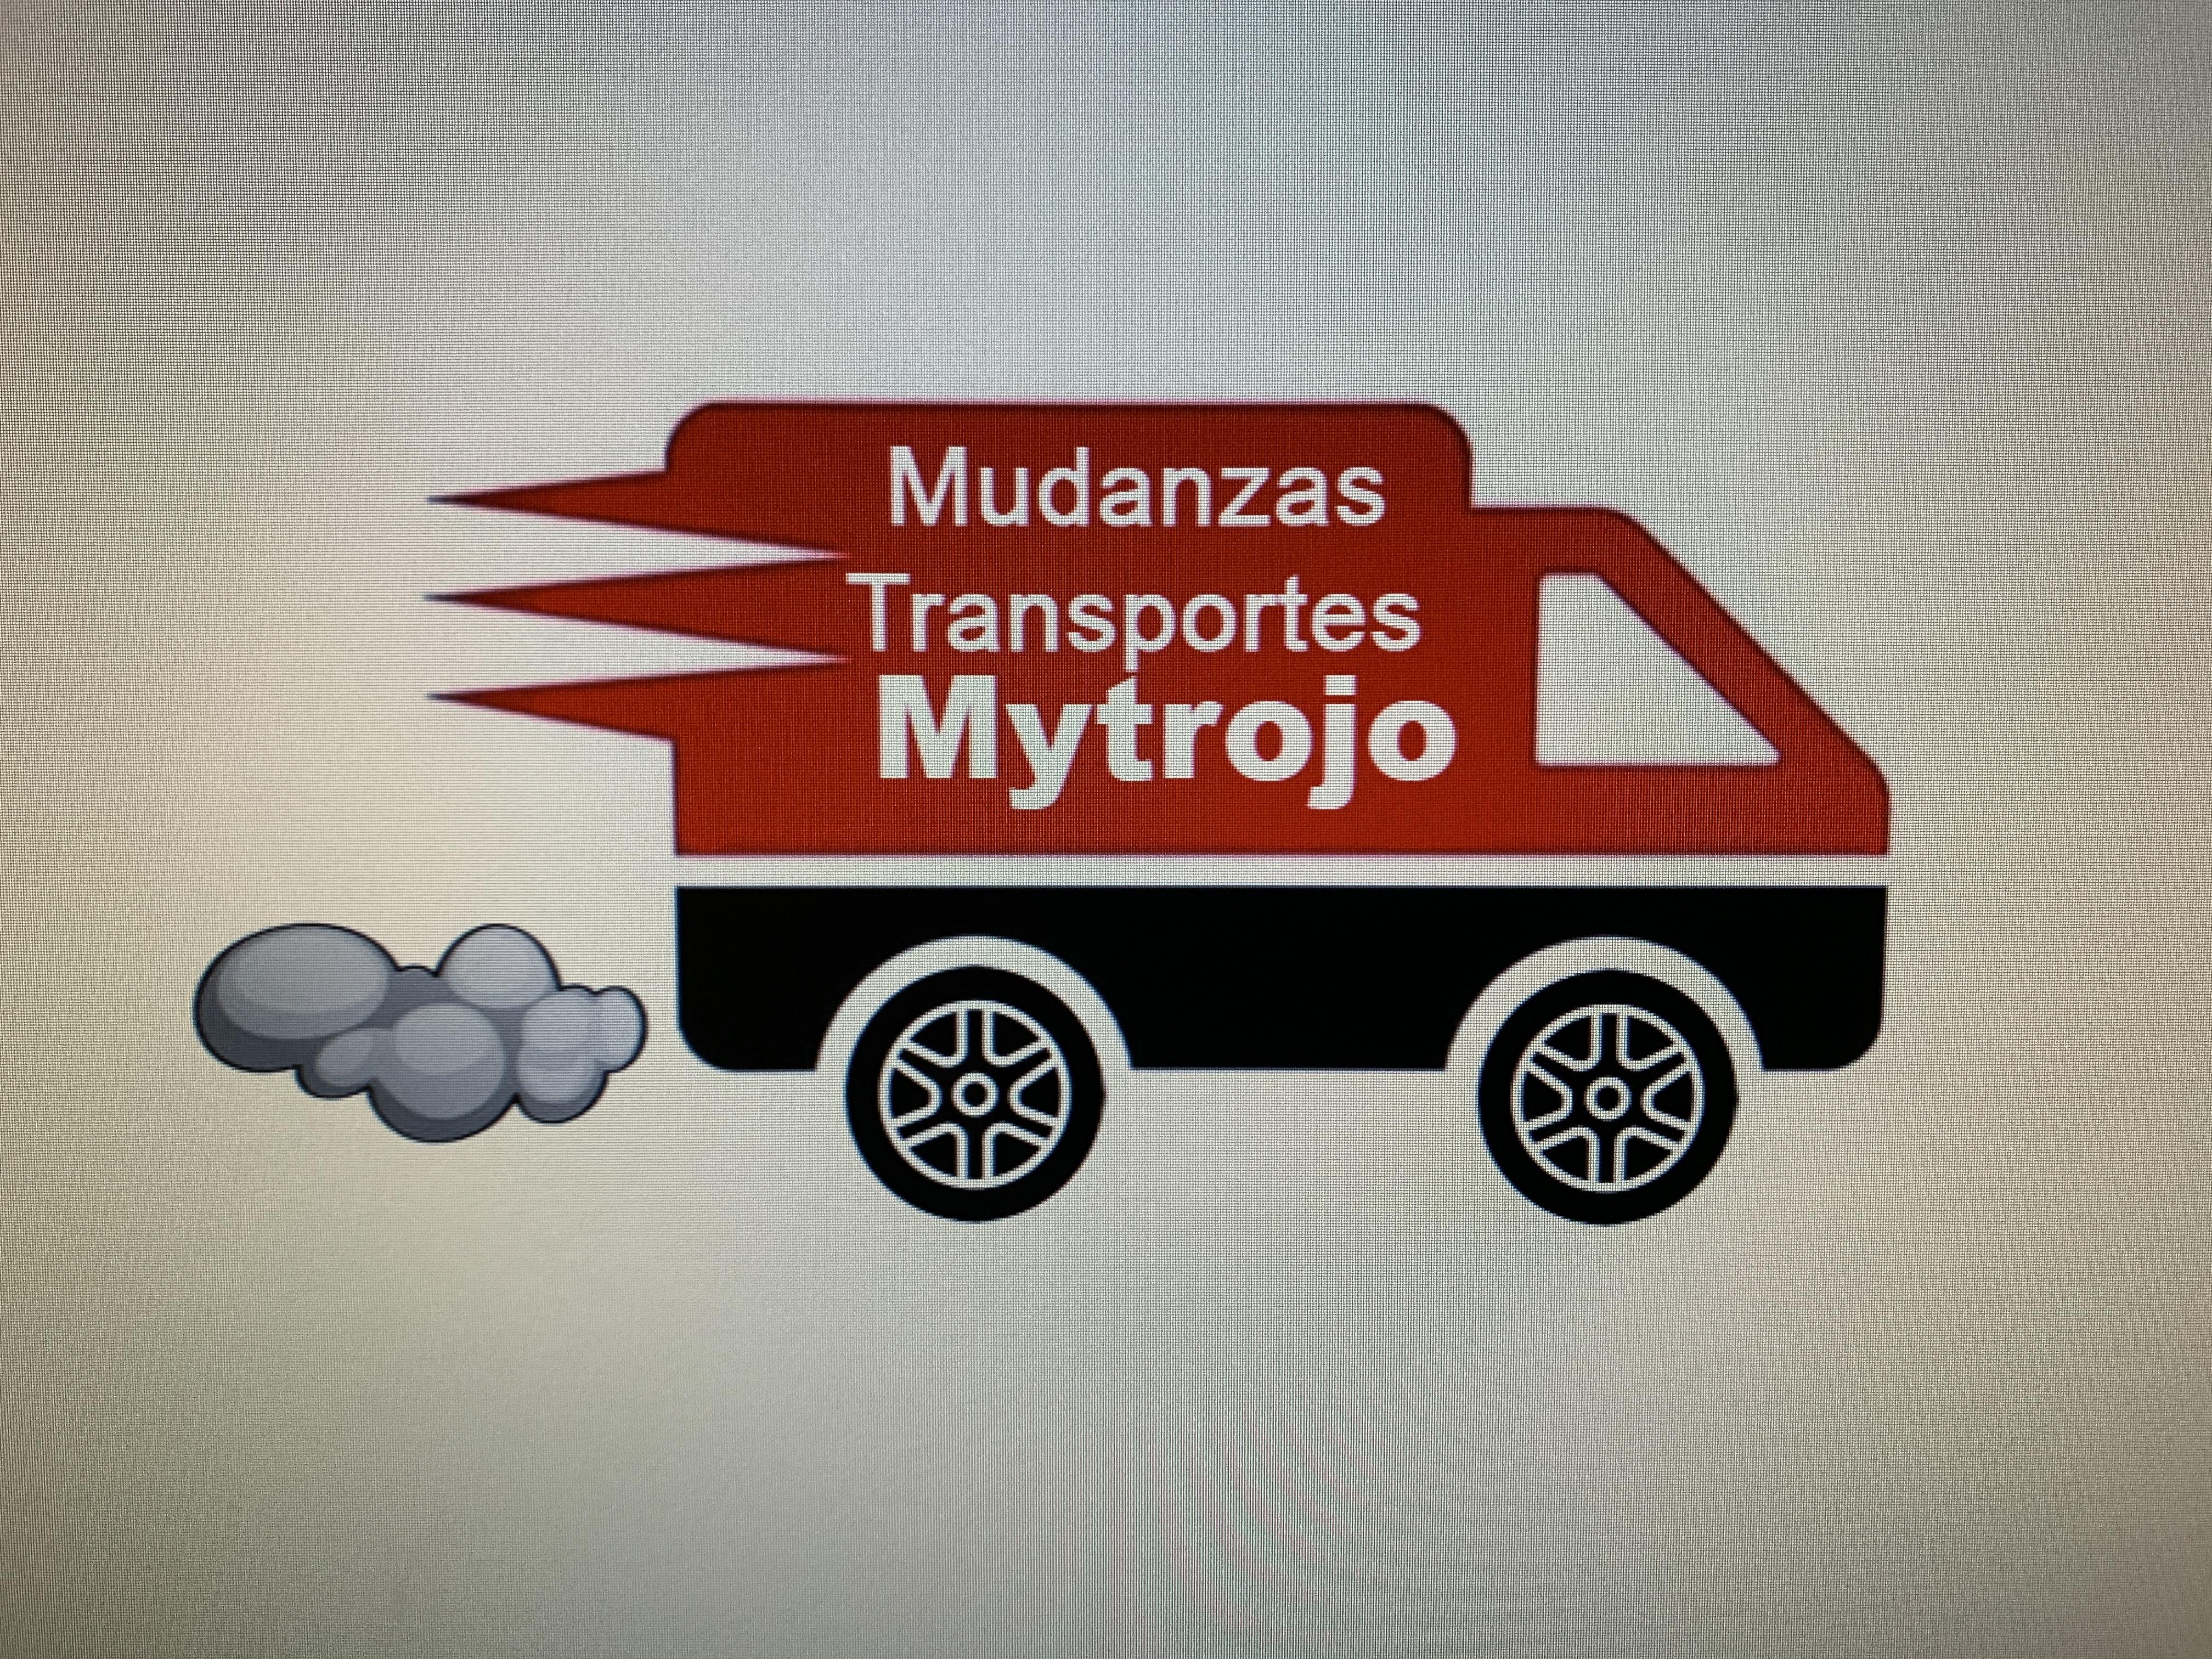 Mytrojo